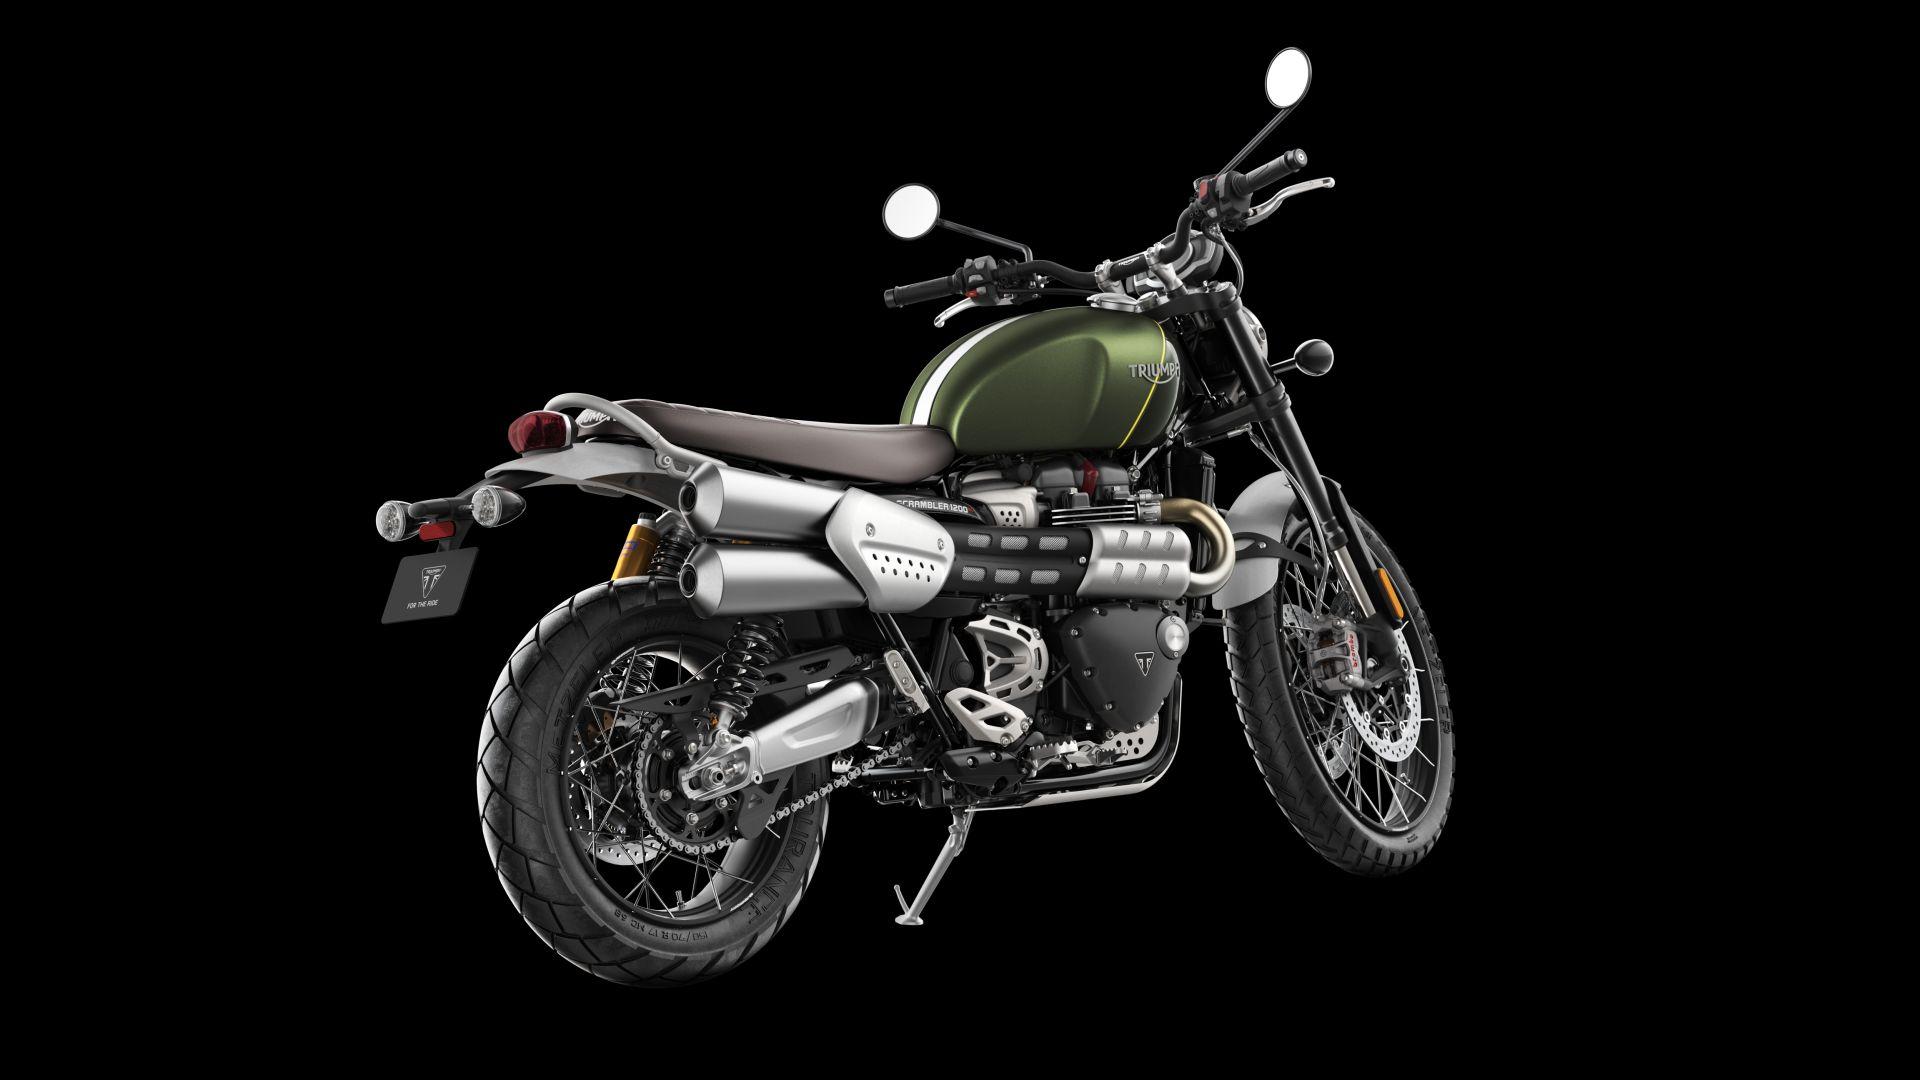 2021 Triumph Scrambler 1200 XE [Specs, Features, Photos]   wBW